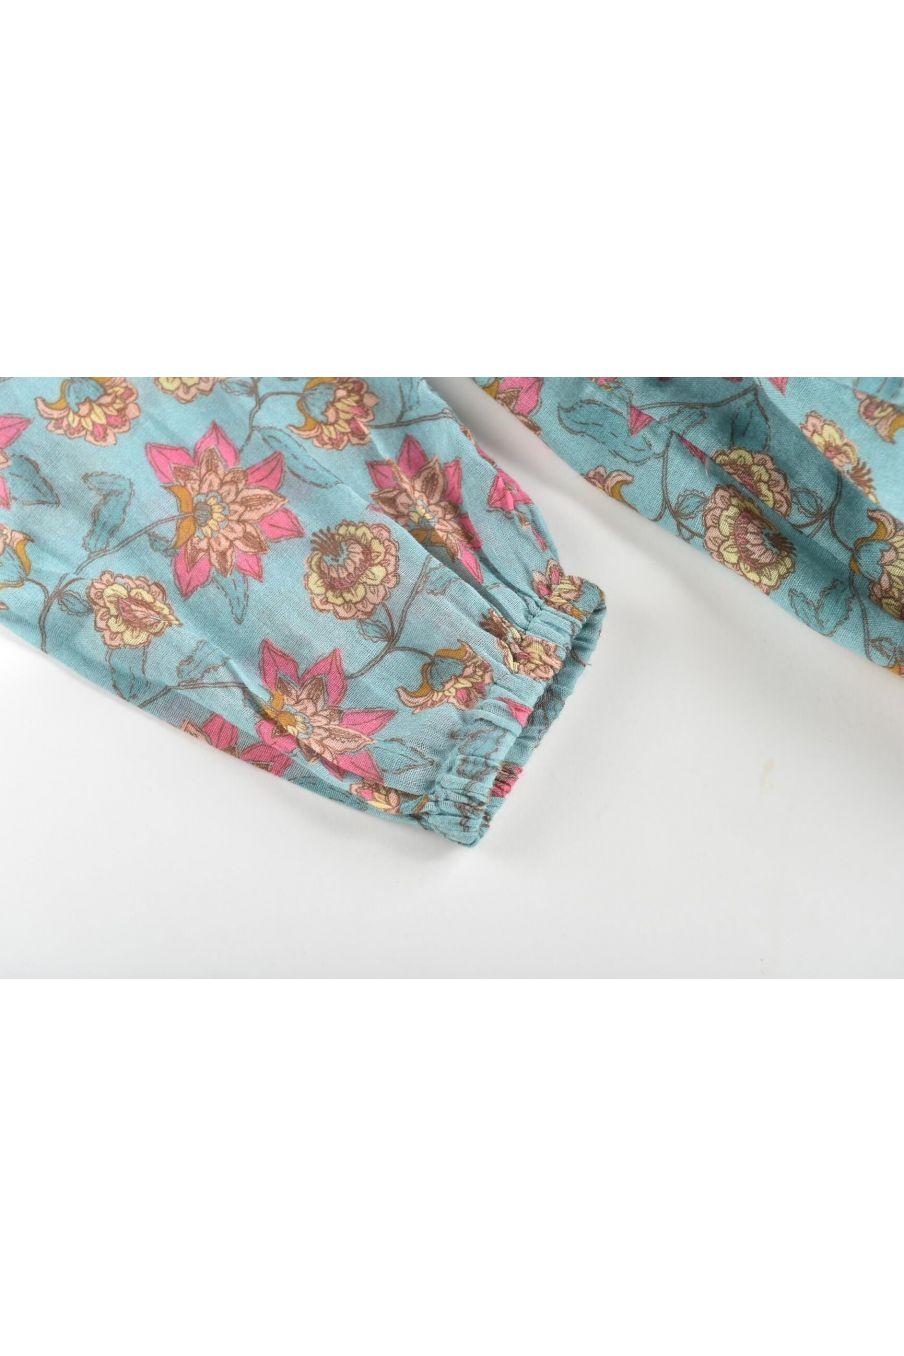 boheme chic vintage robe fille bisiali turquoise flowers